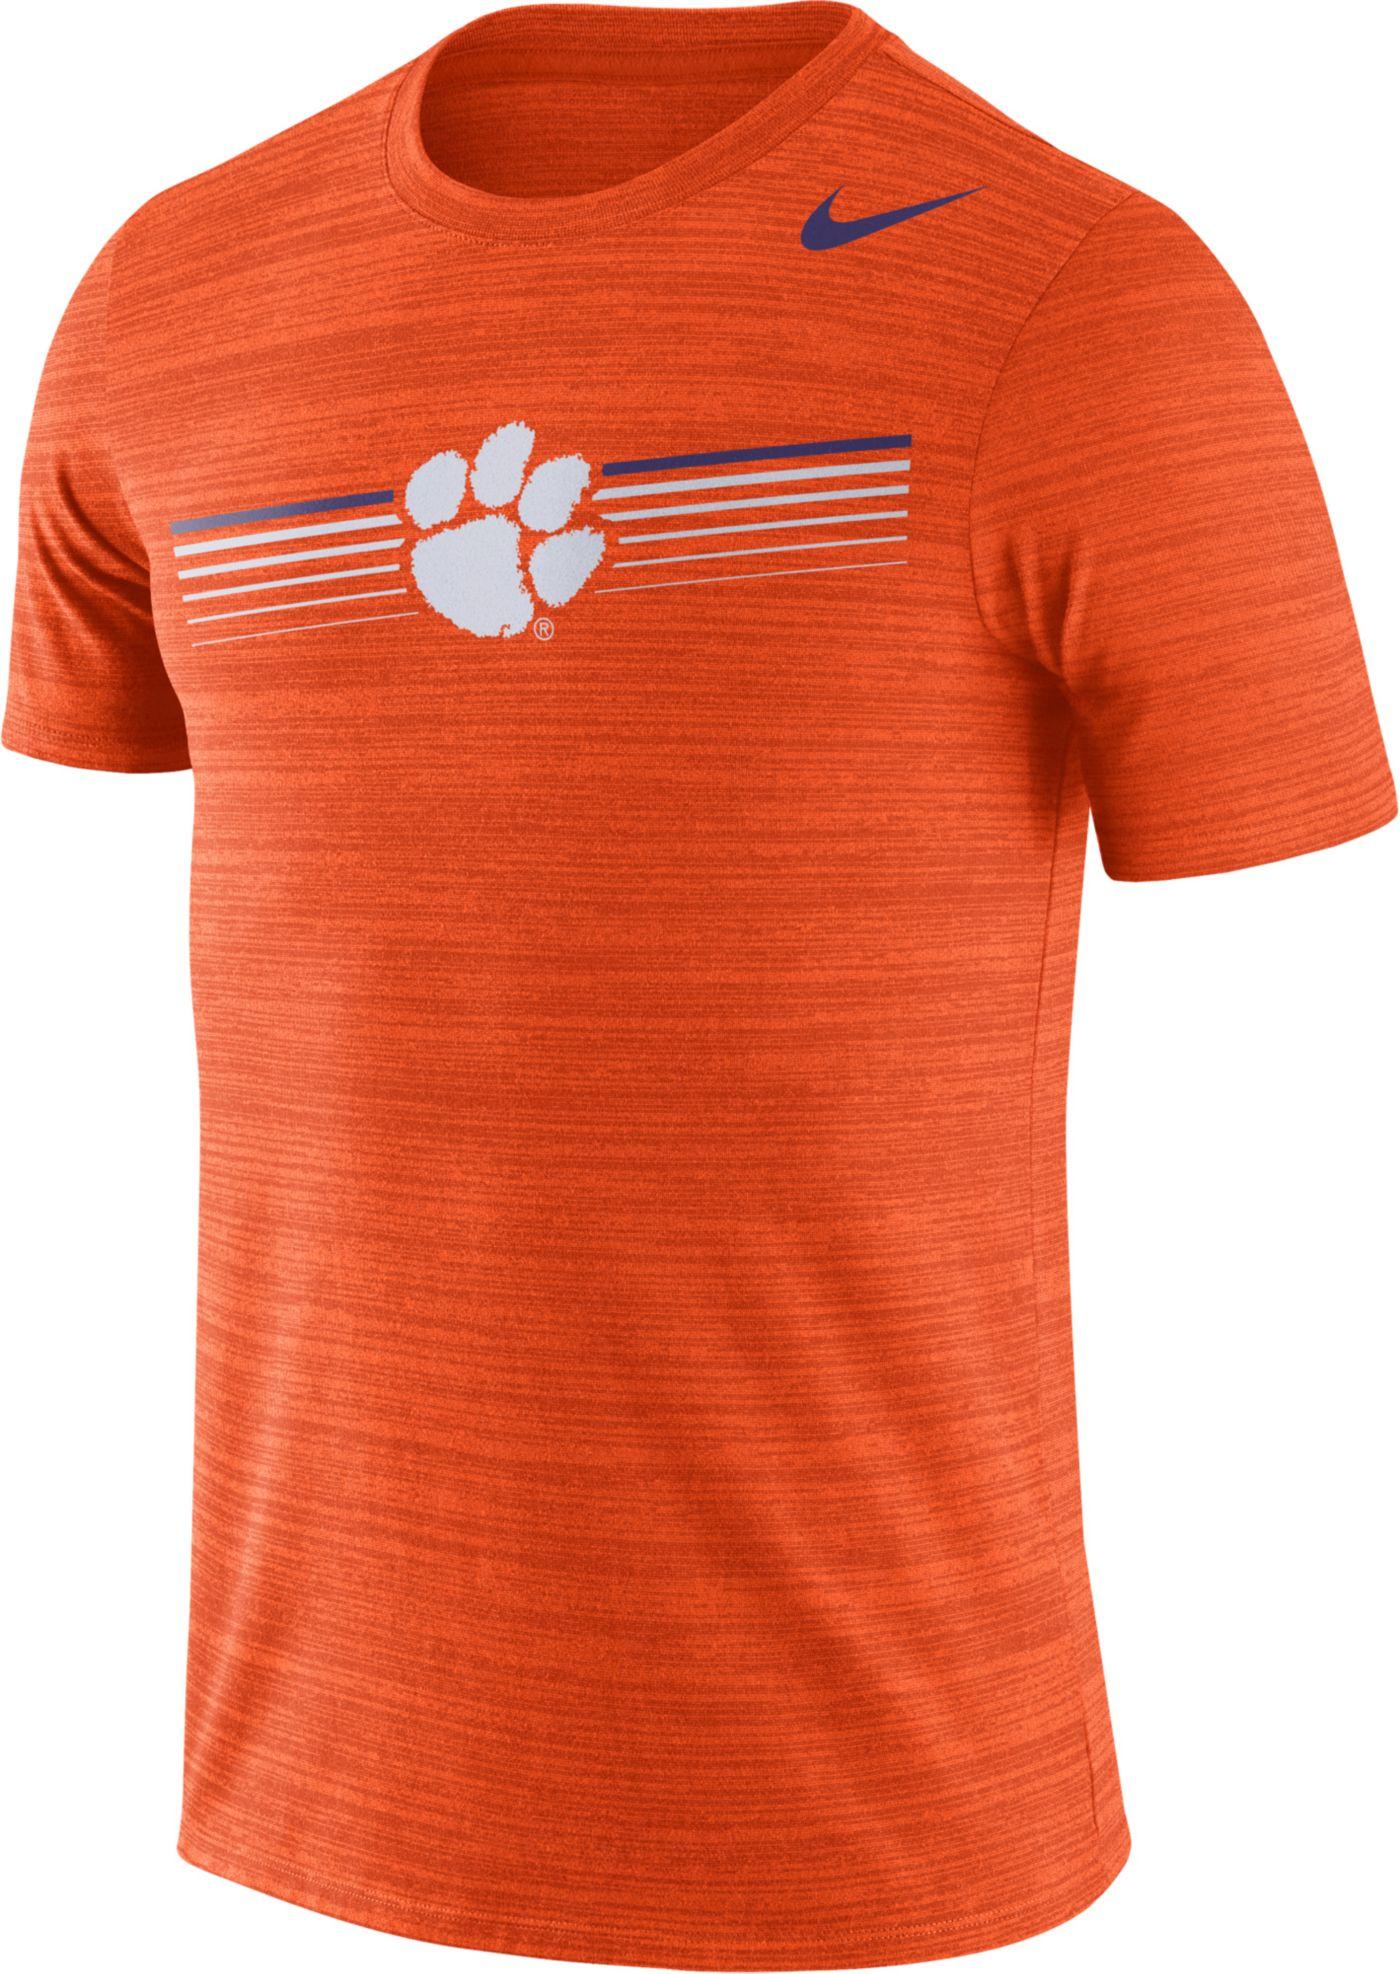 Nike Men's Clemson Tigers Orange Velocity Legend Graphic T-Shirt